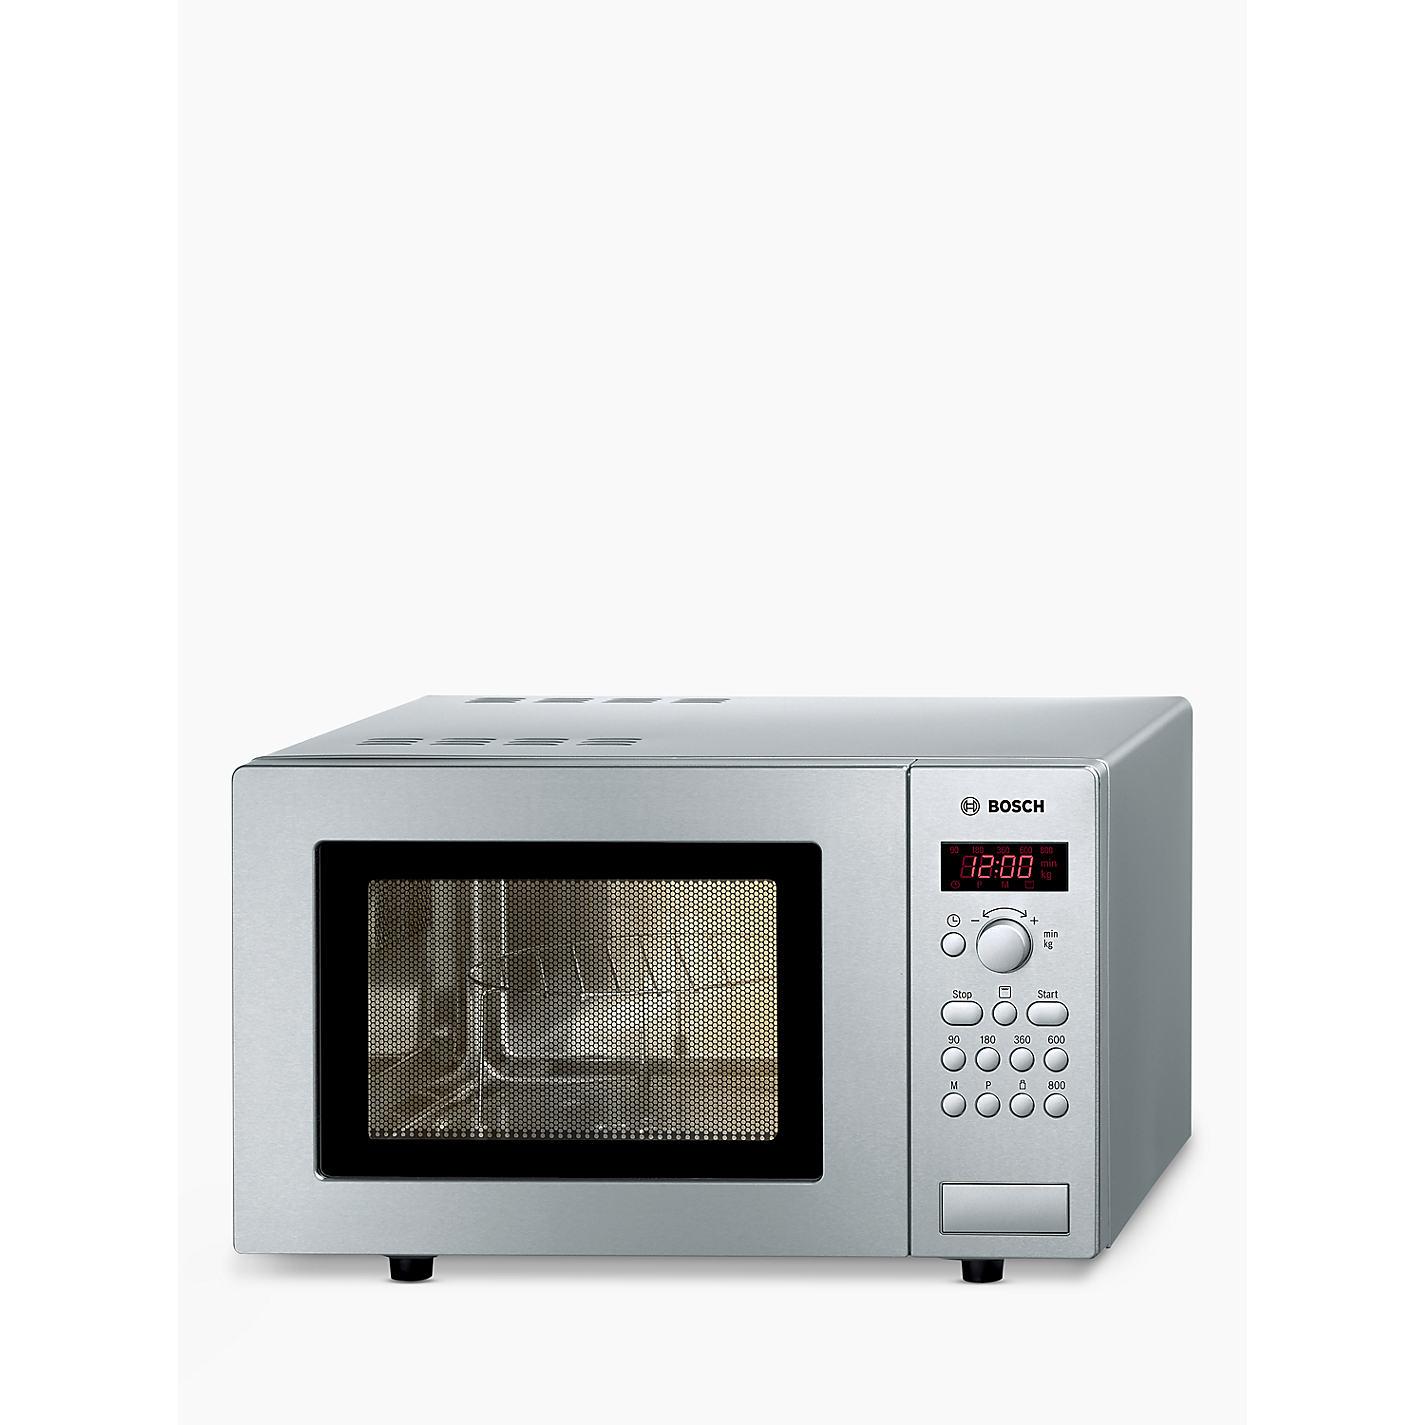 microwave India